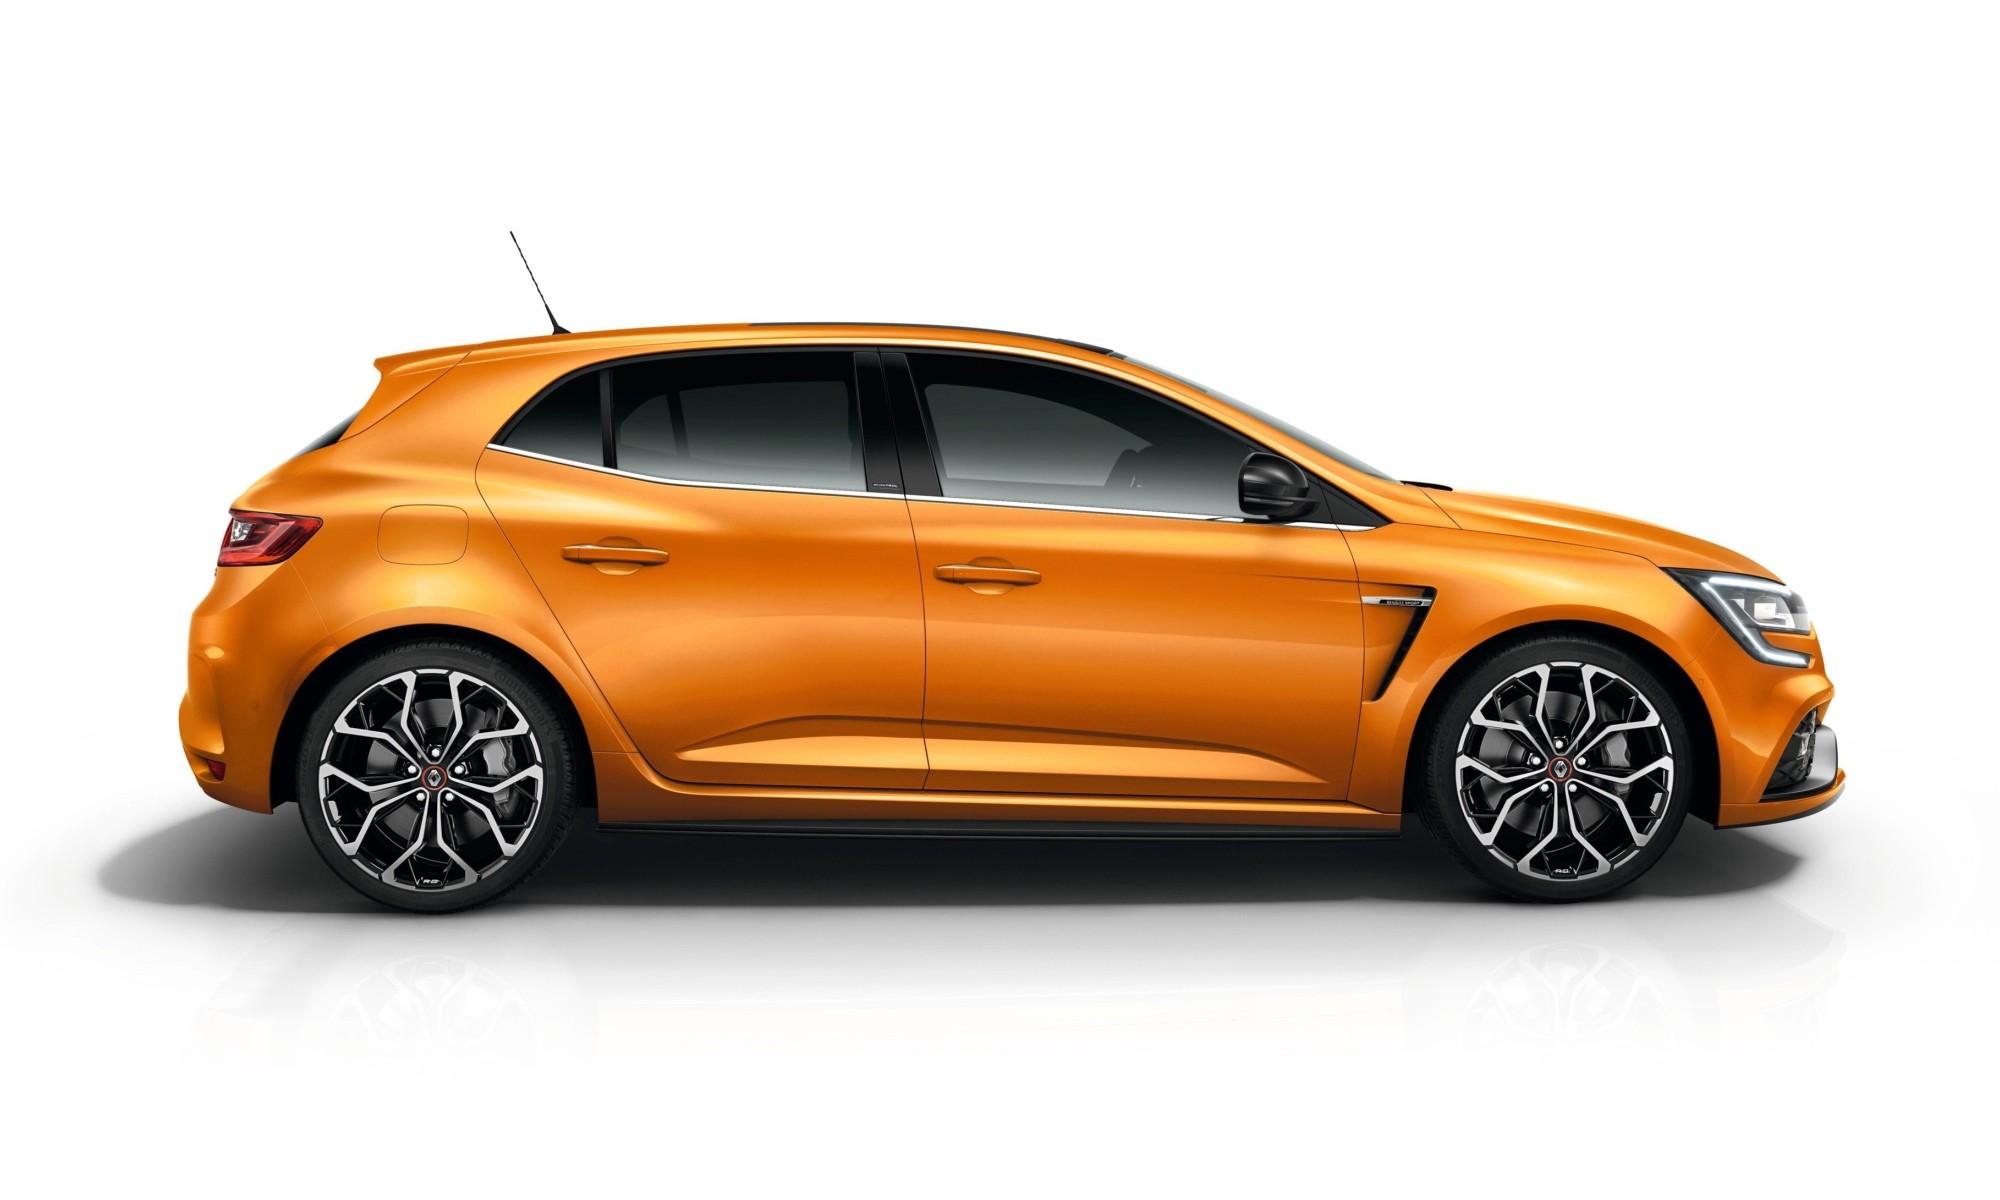 Renault Megane RS EDC Lux profile